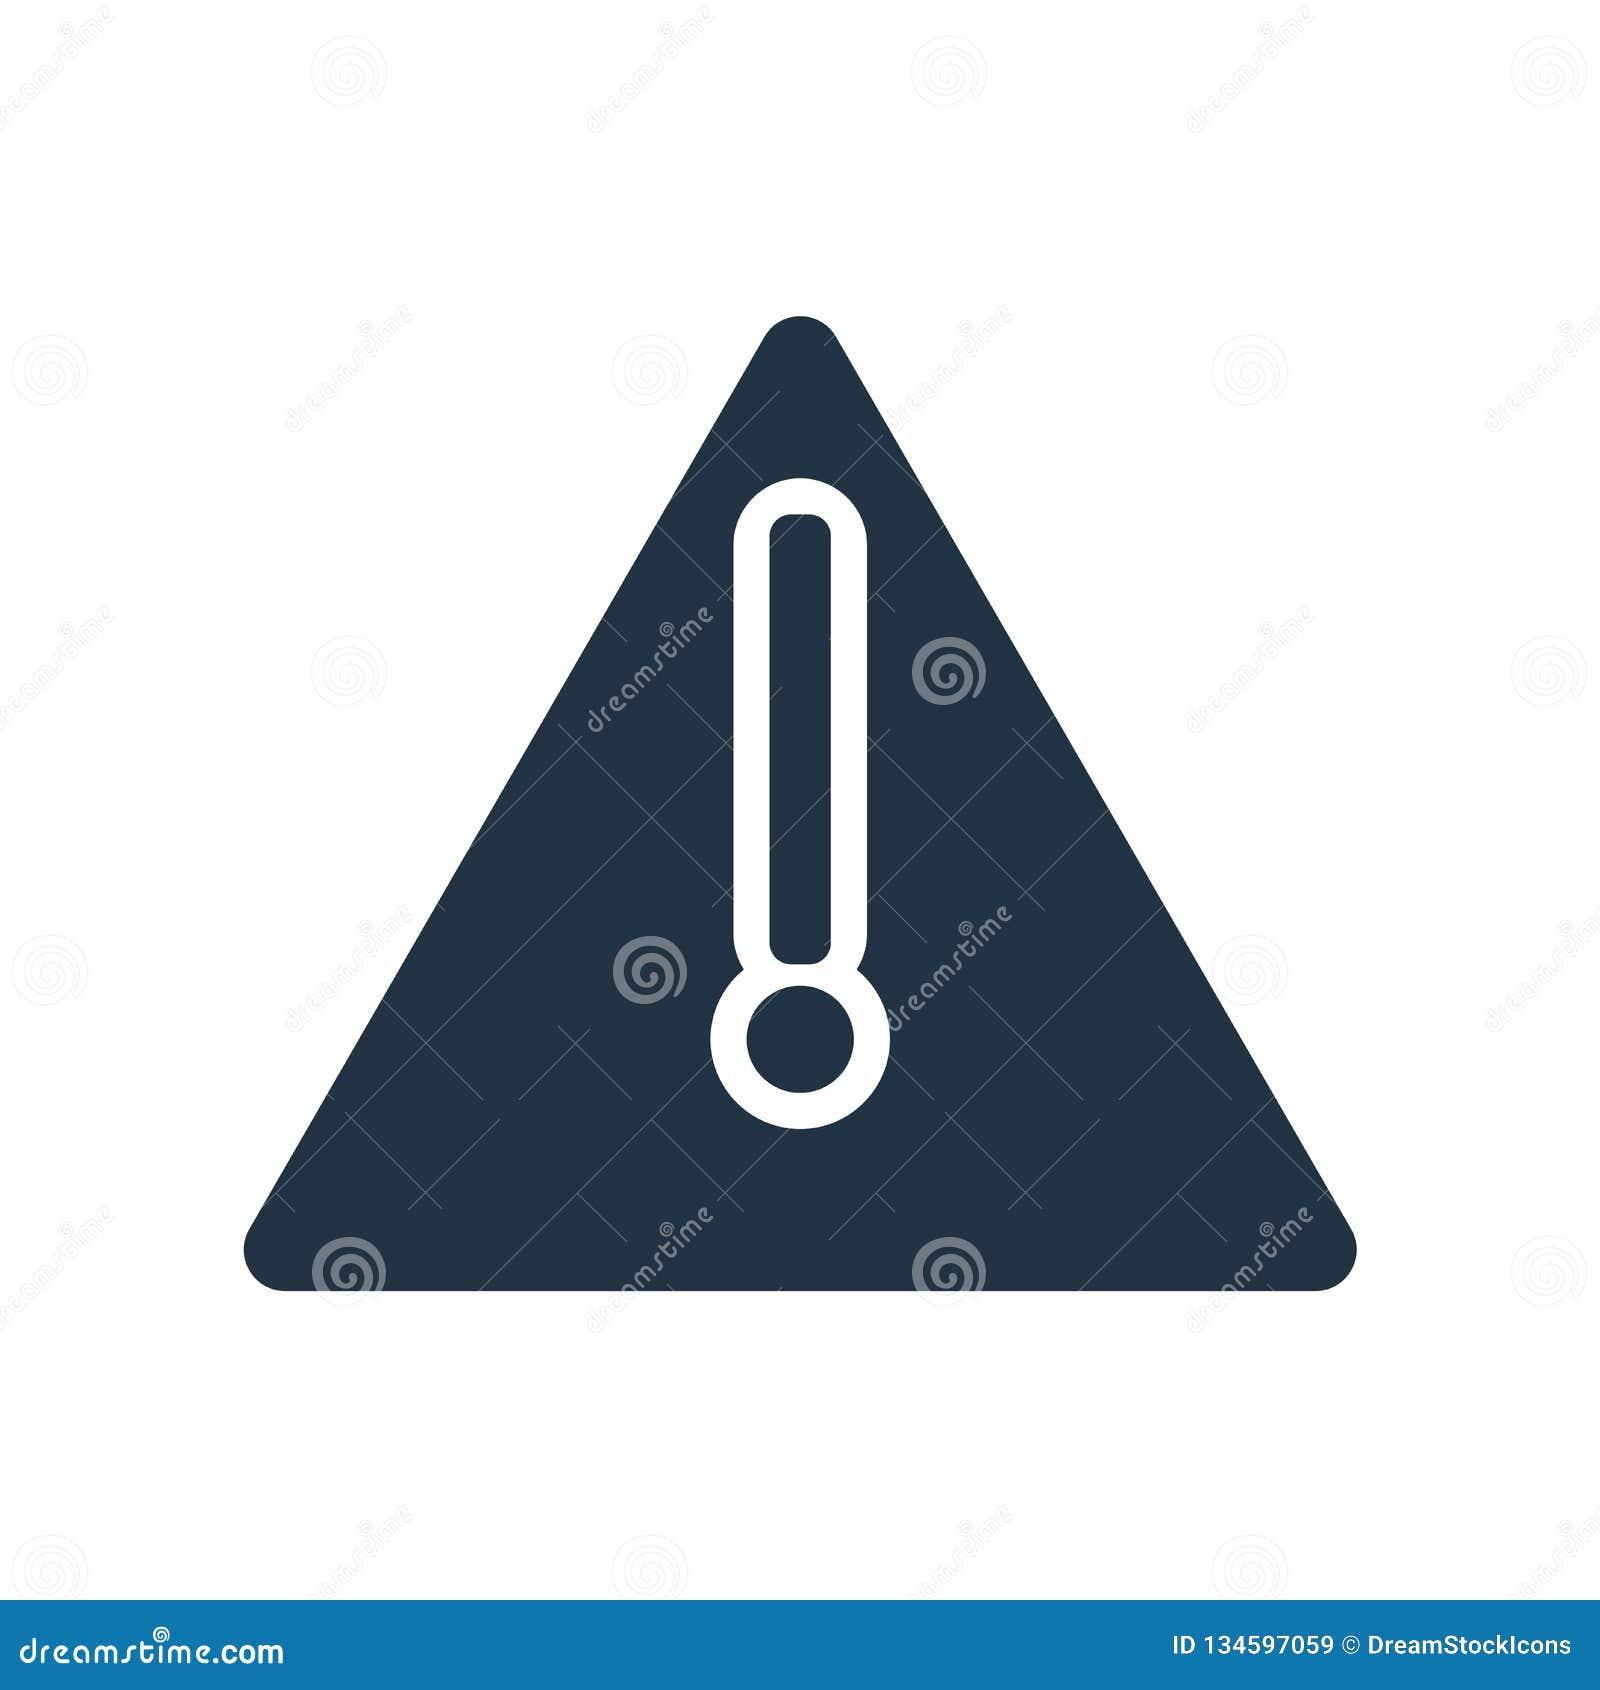 Vetor de advertência do ícone isolado no fundo branco, sinal de aviso